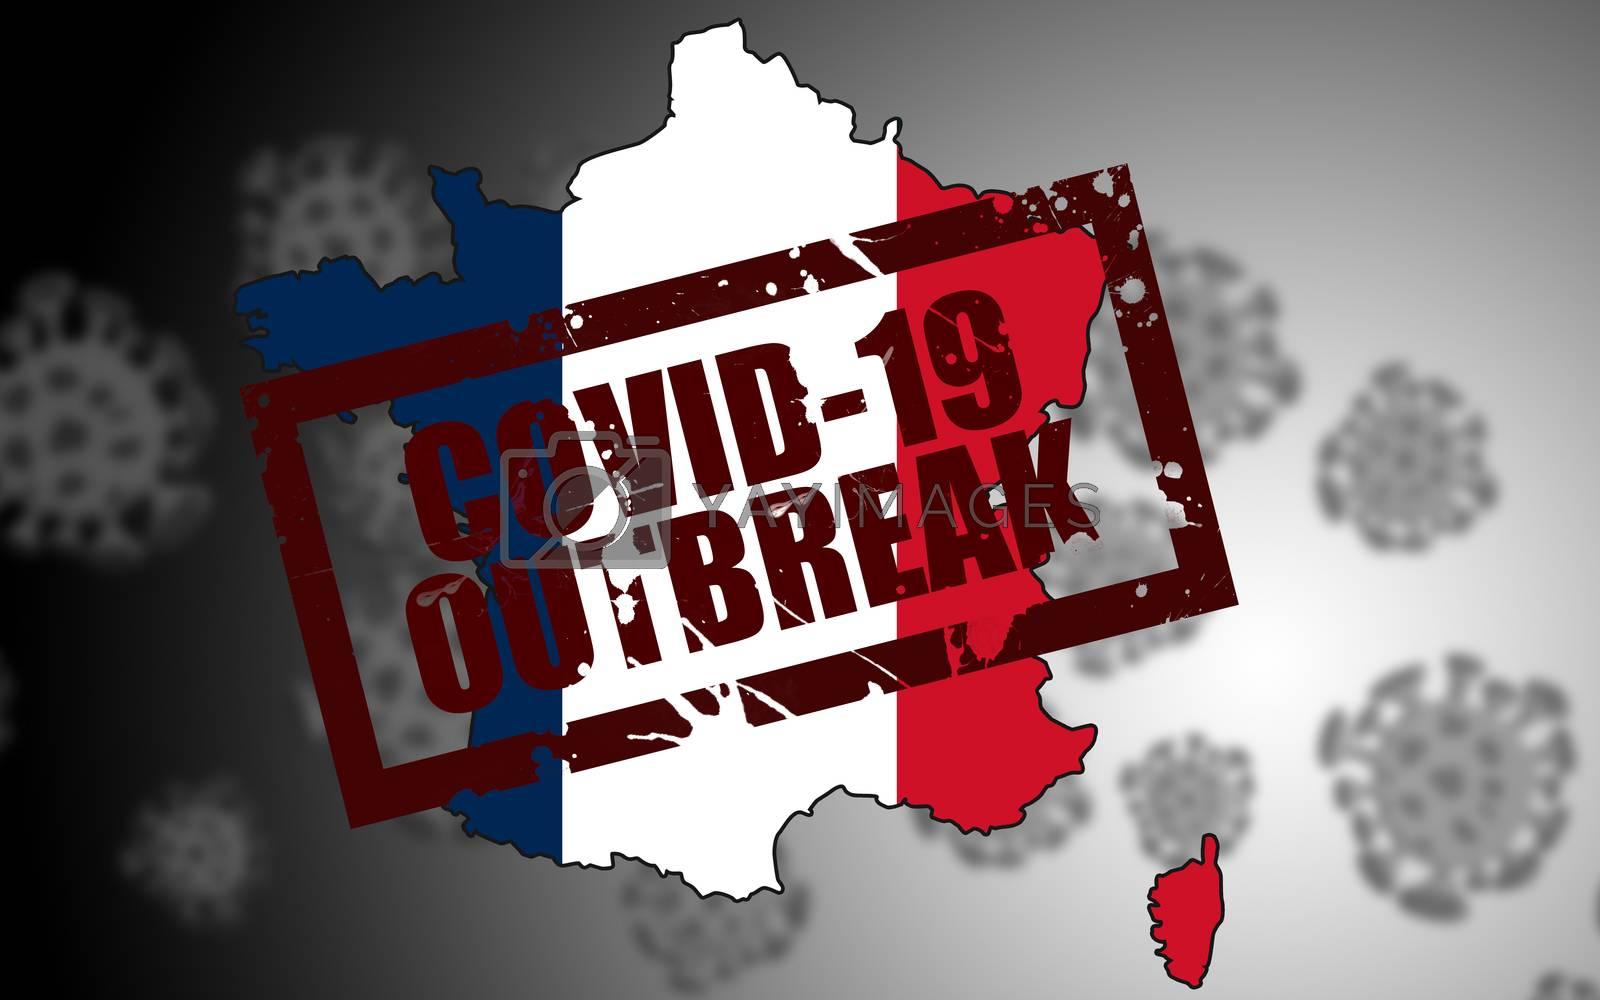 Covid-19 virus outbreak in France. 3d rendering